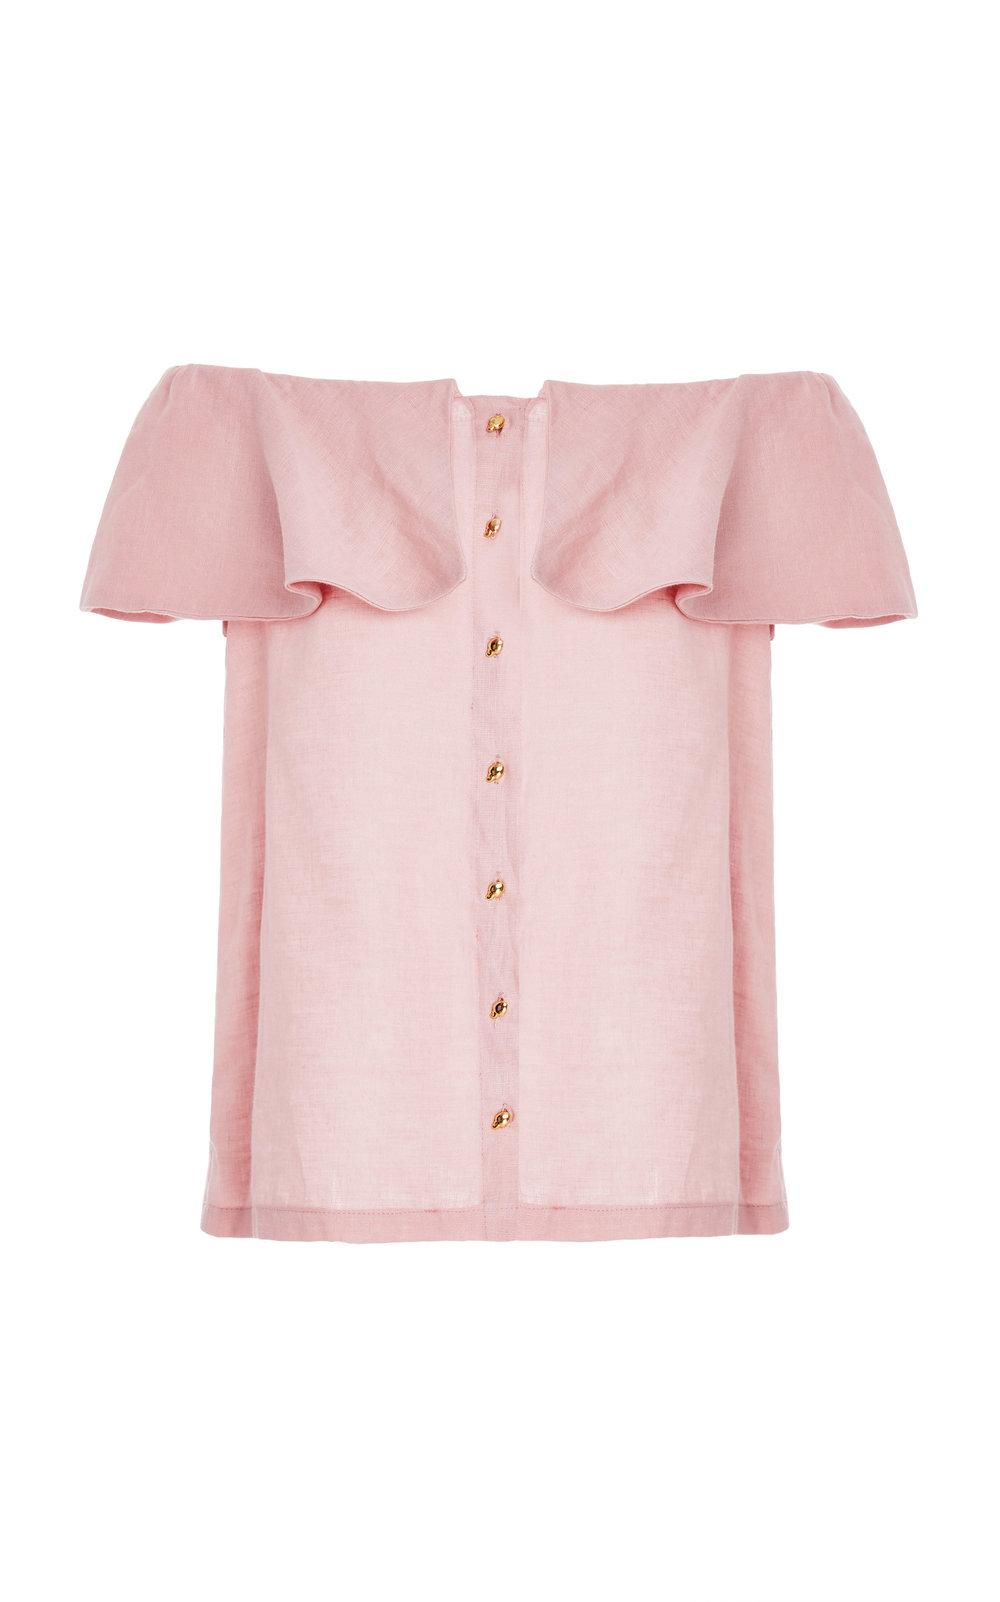 large_isolda-pink-itacimirim-off-the-shoulder-top.jpg